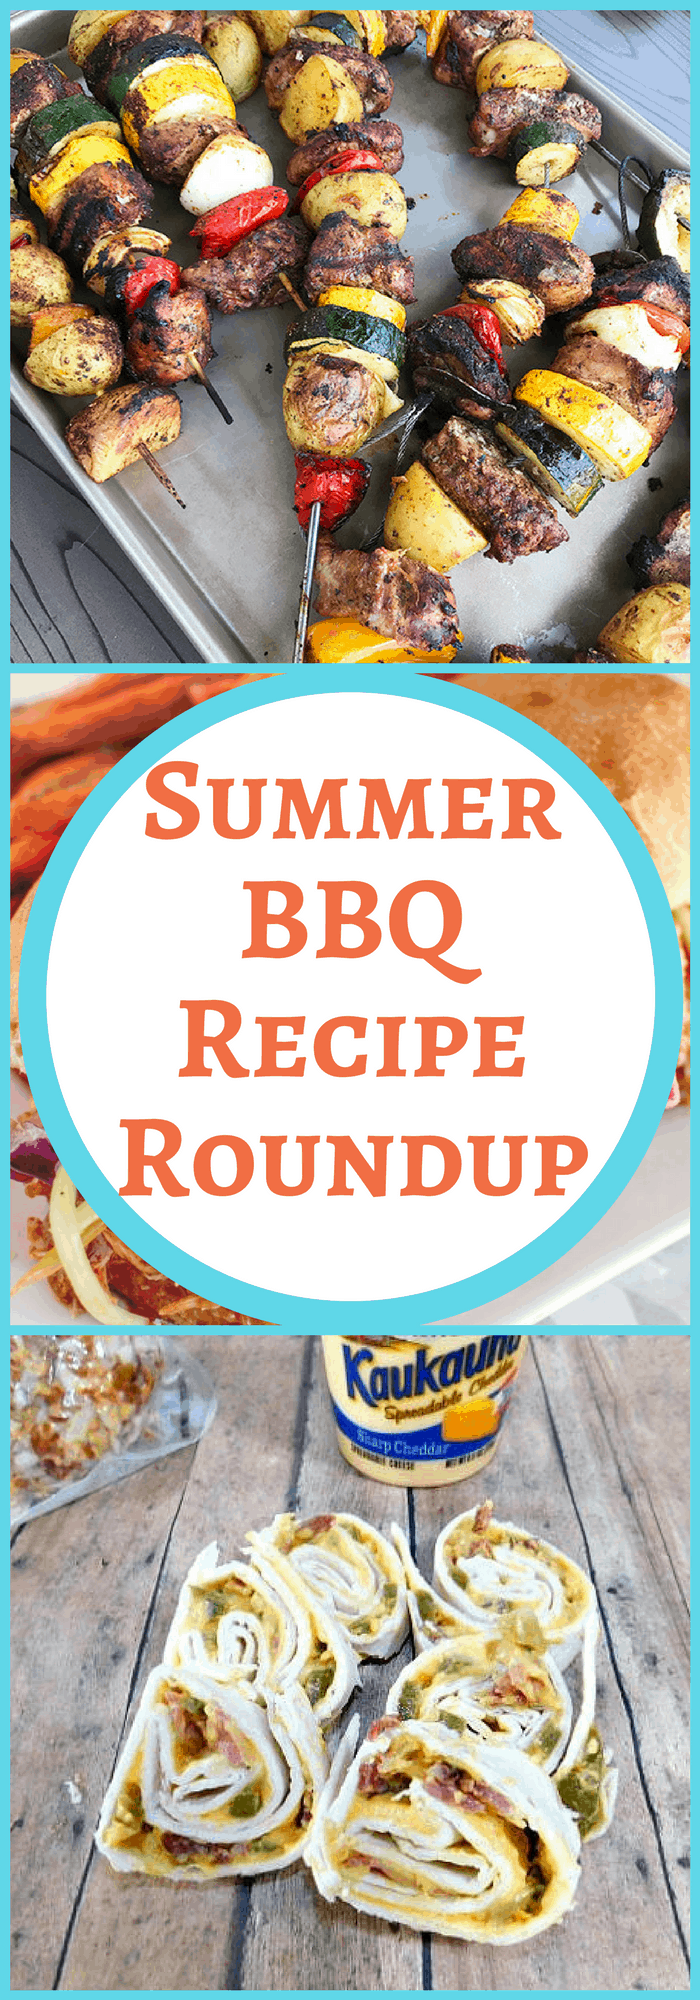 Recipes--Summer BBQ Recipe Roundup--The Organized Mom